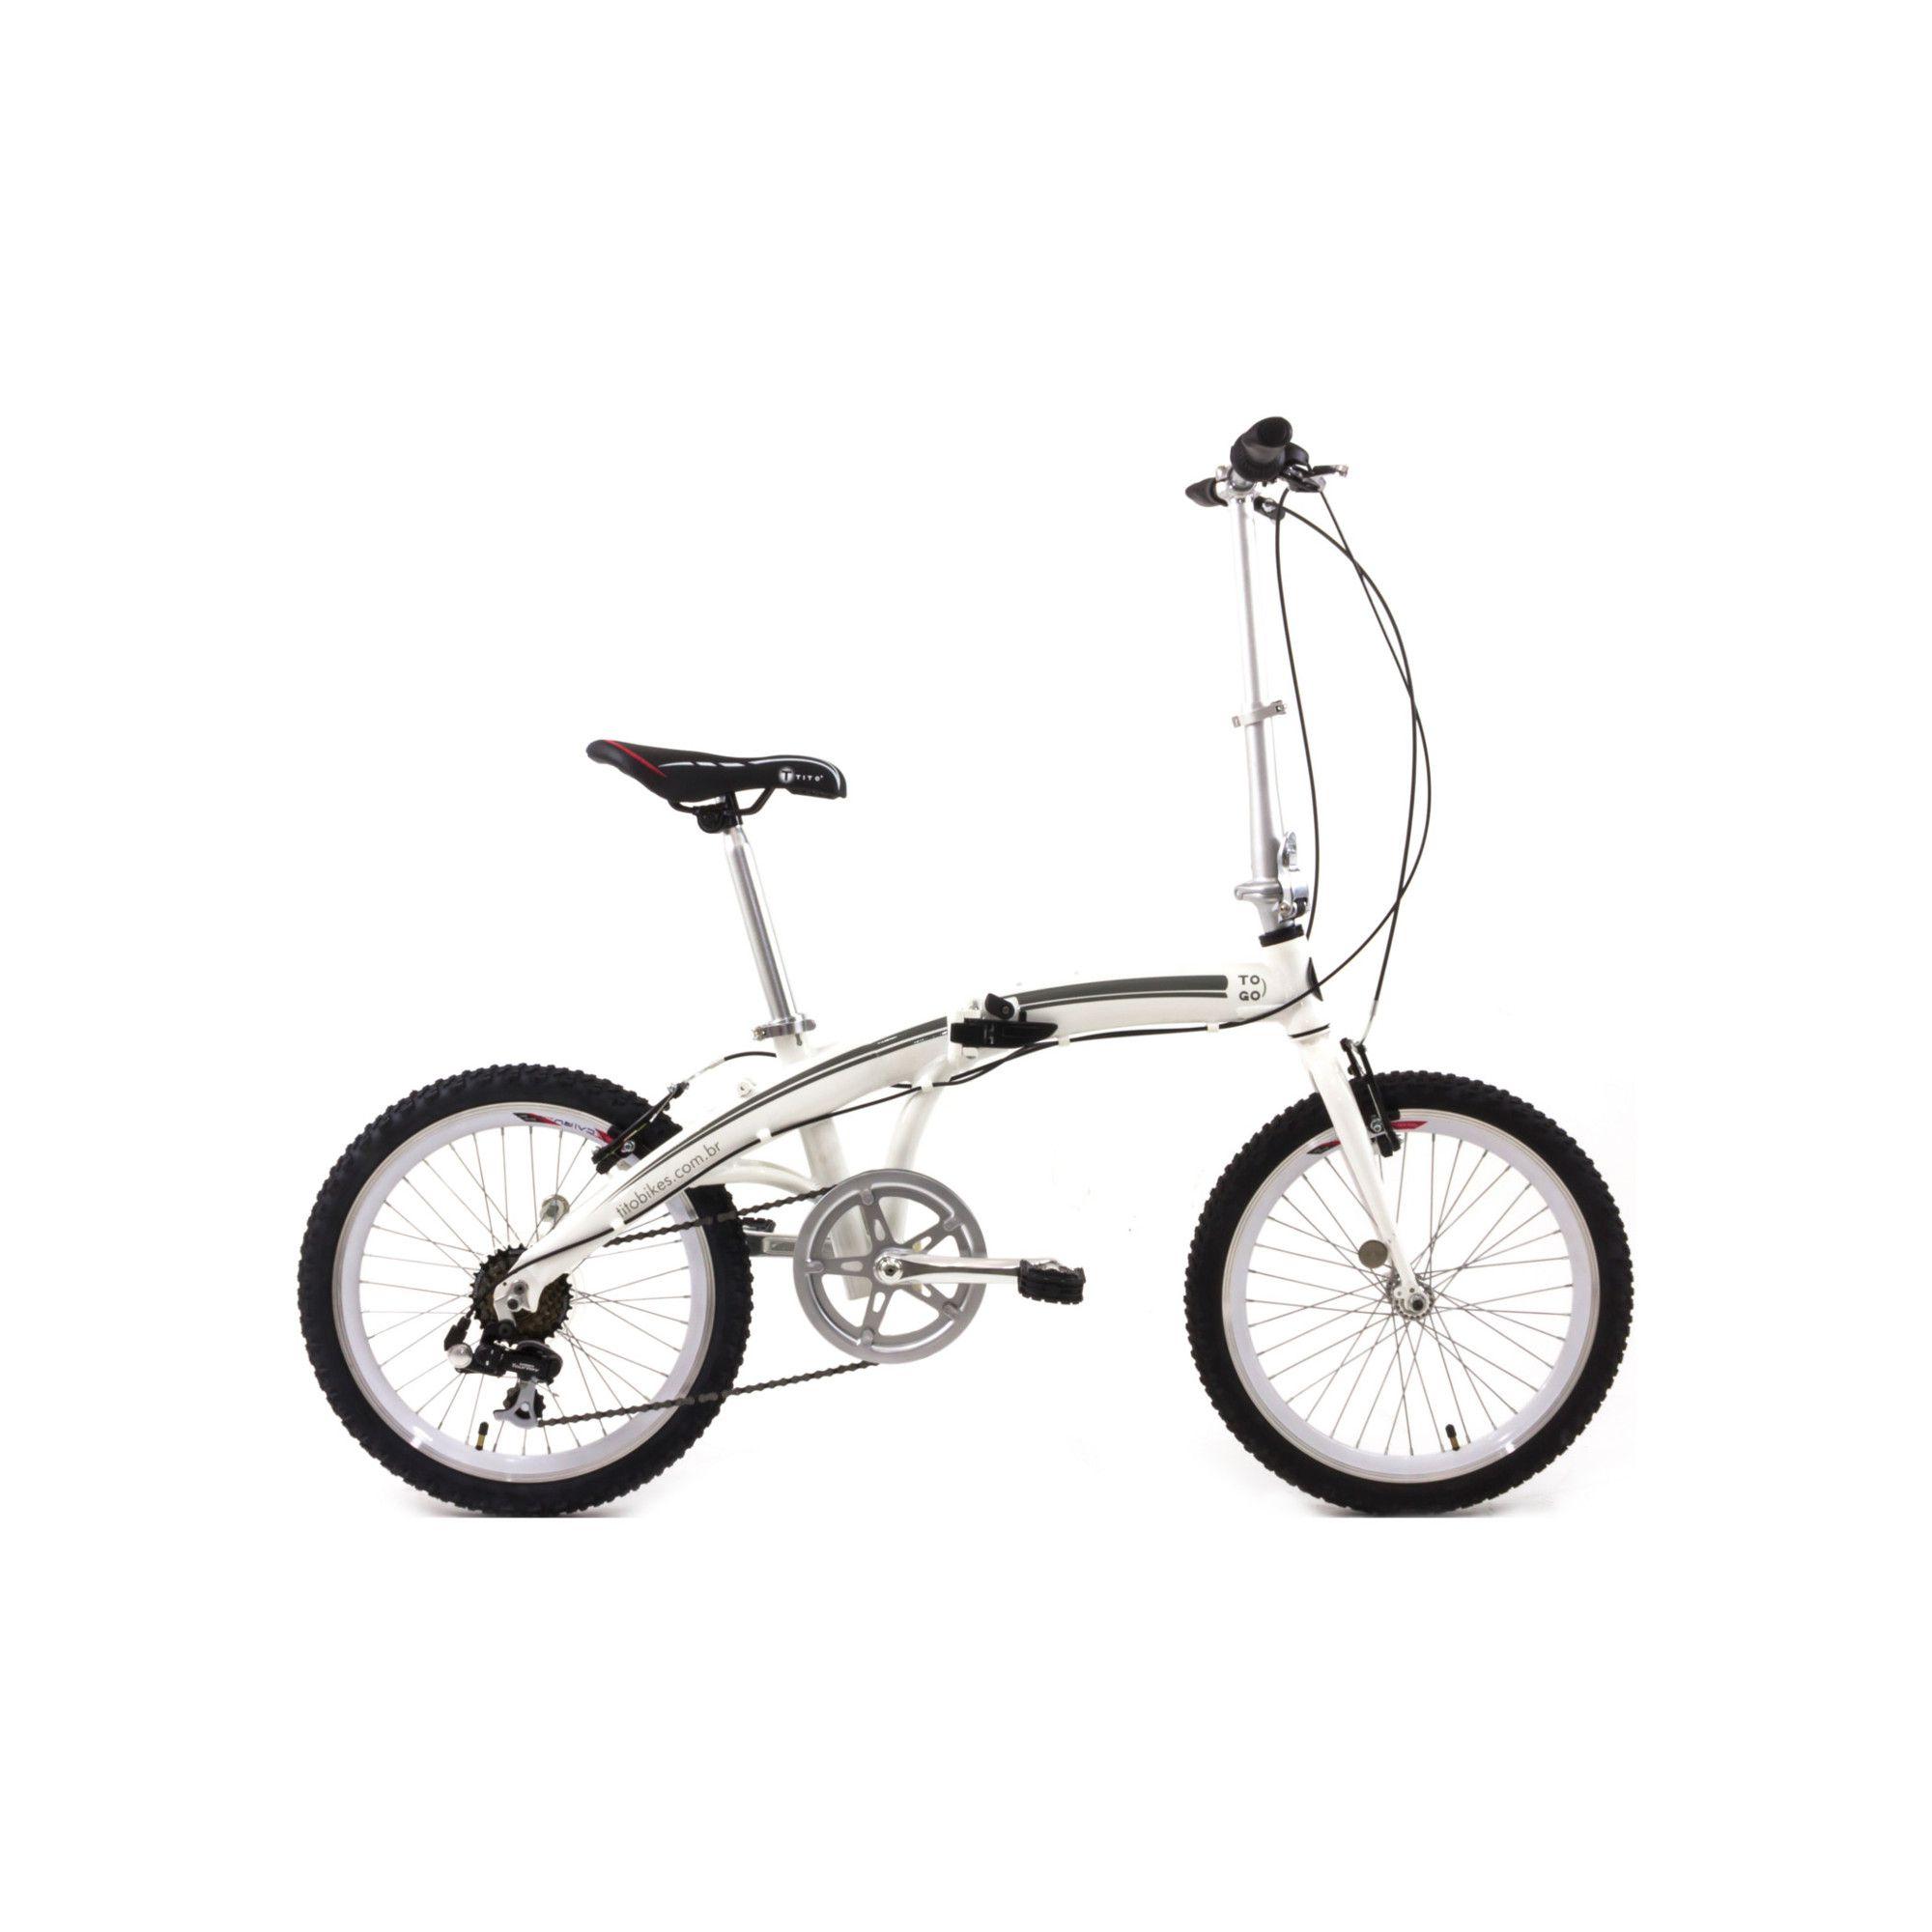 Bicicleta Urbana Dobrável Tito To Go 20